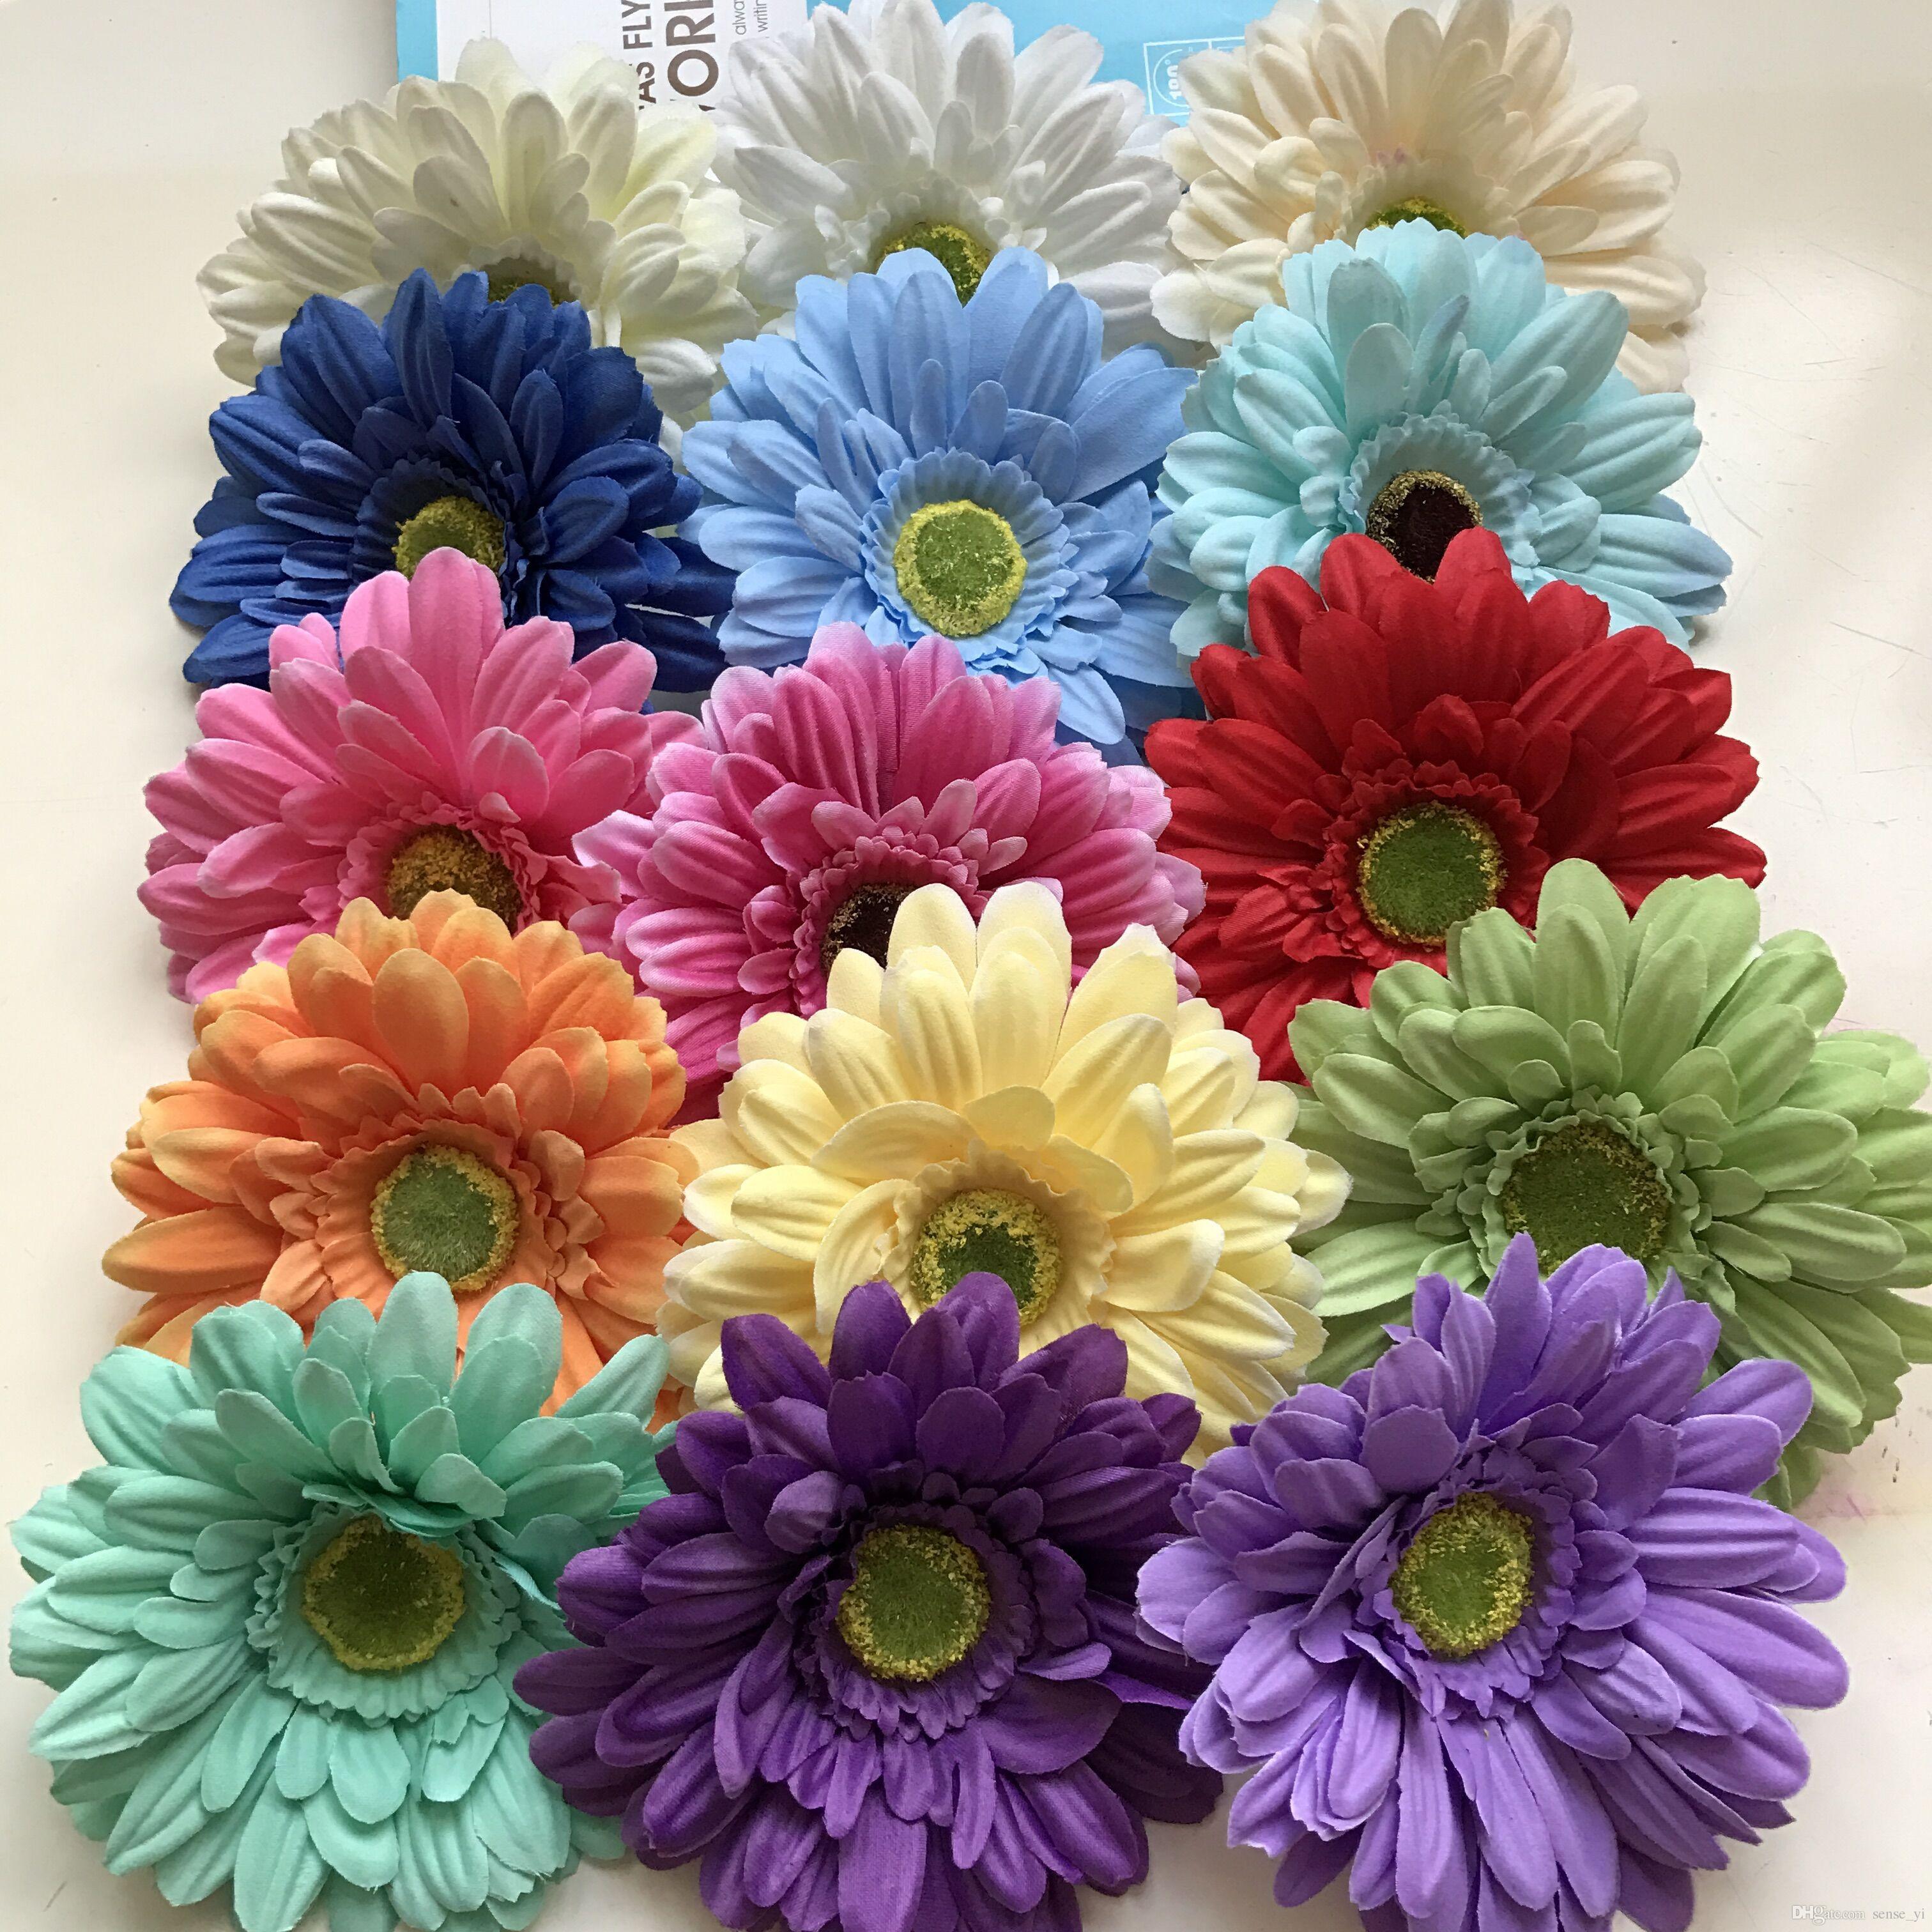 Silk Daisy Artificial Flowers For Wedding Home Decoration 13cm Chrysanthemum Mariage Flores Decorative Flowers Plants Silk Flowers line with $60 11 Piece